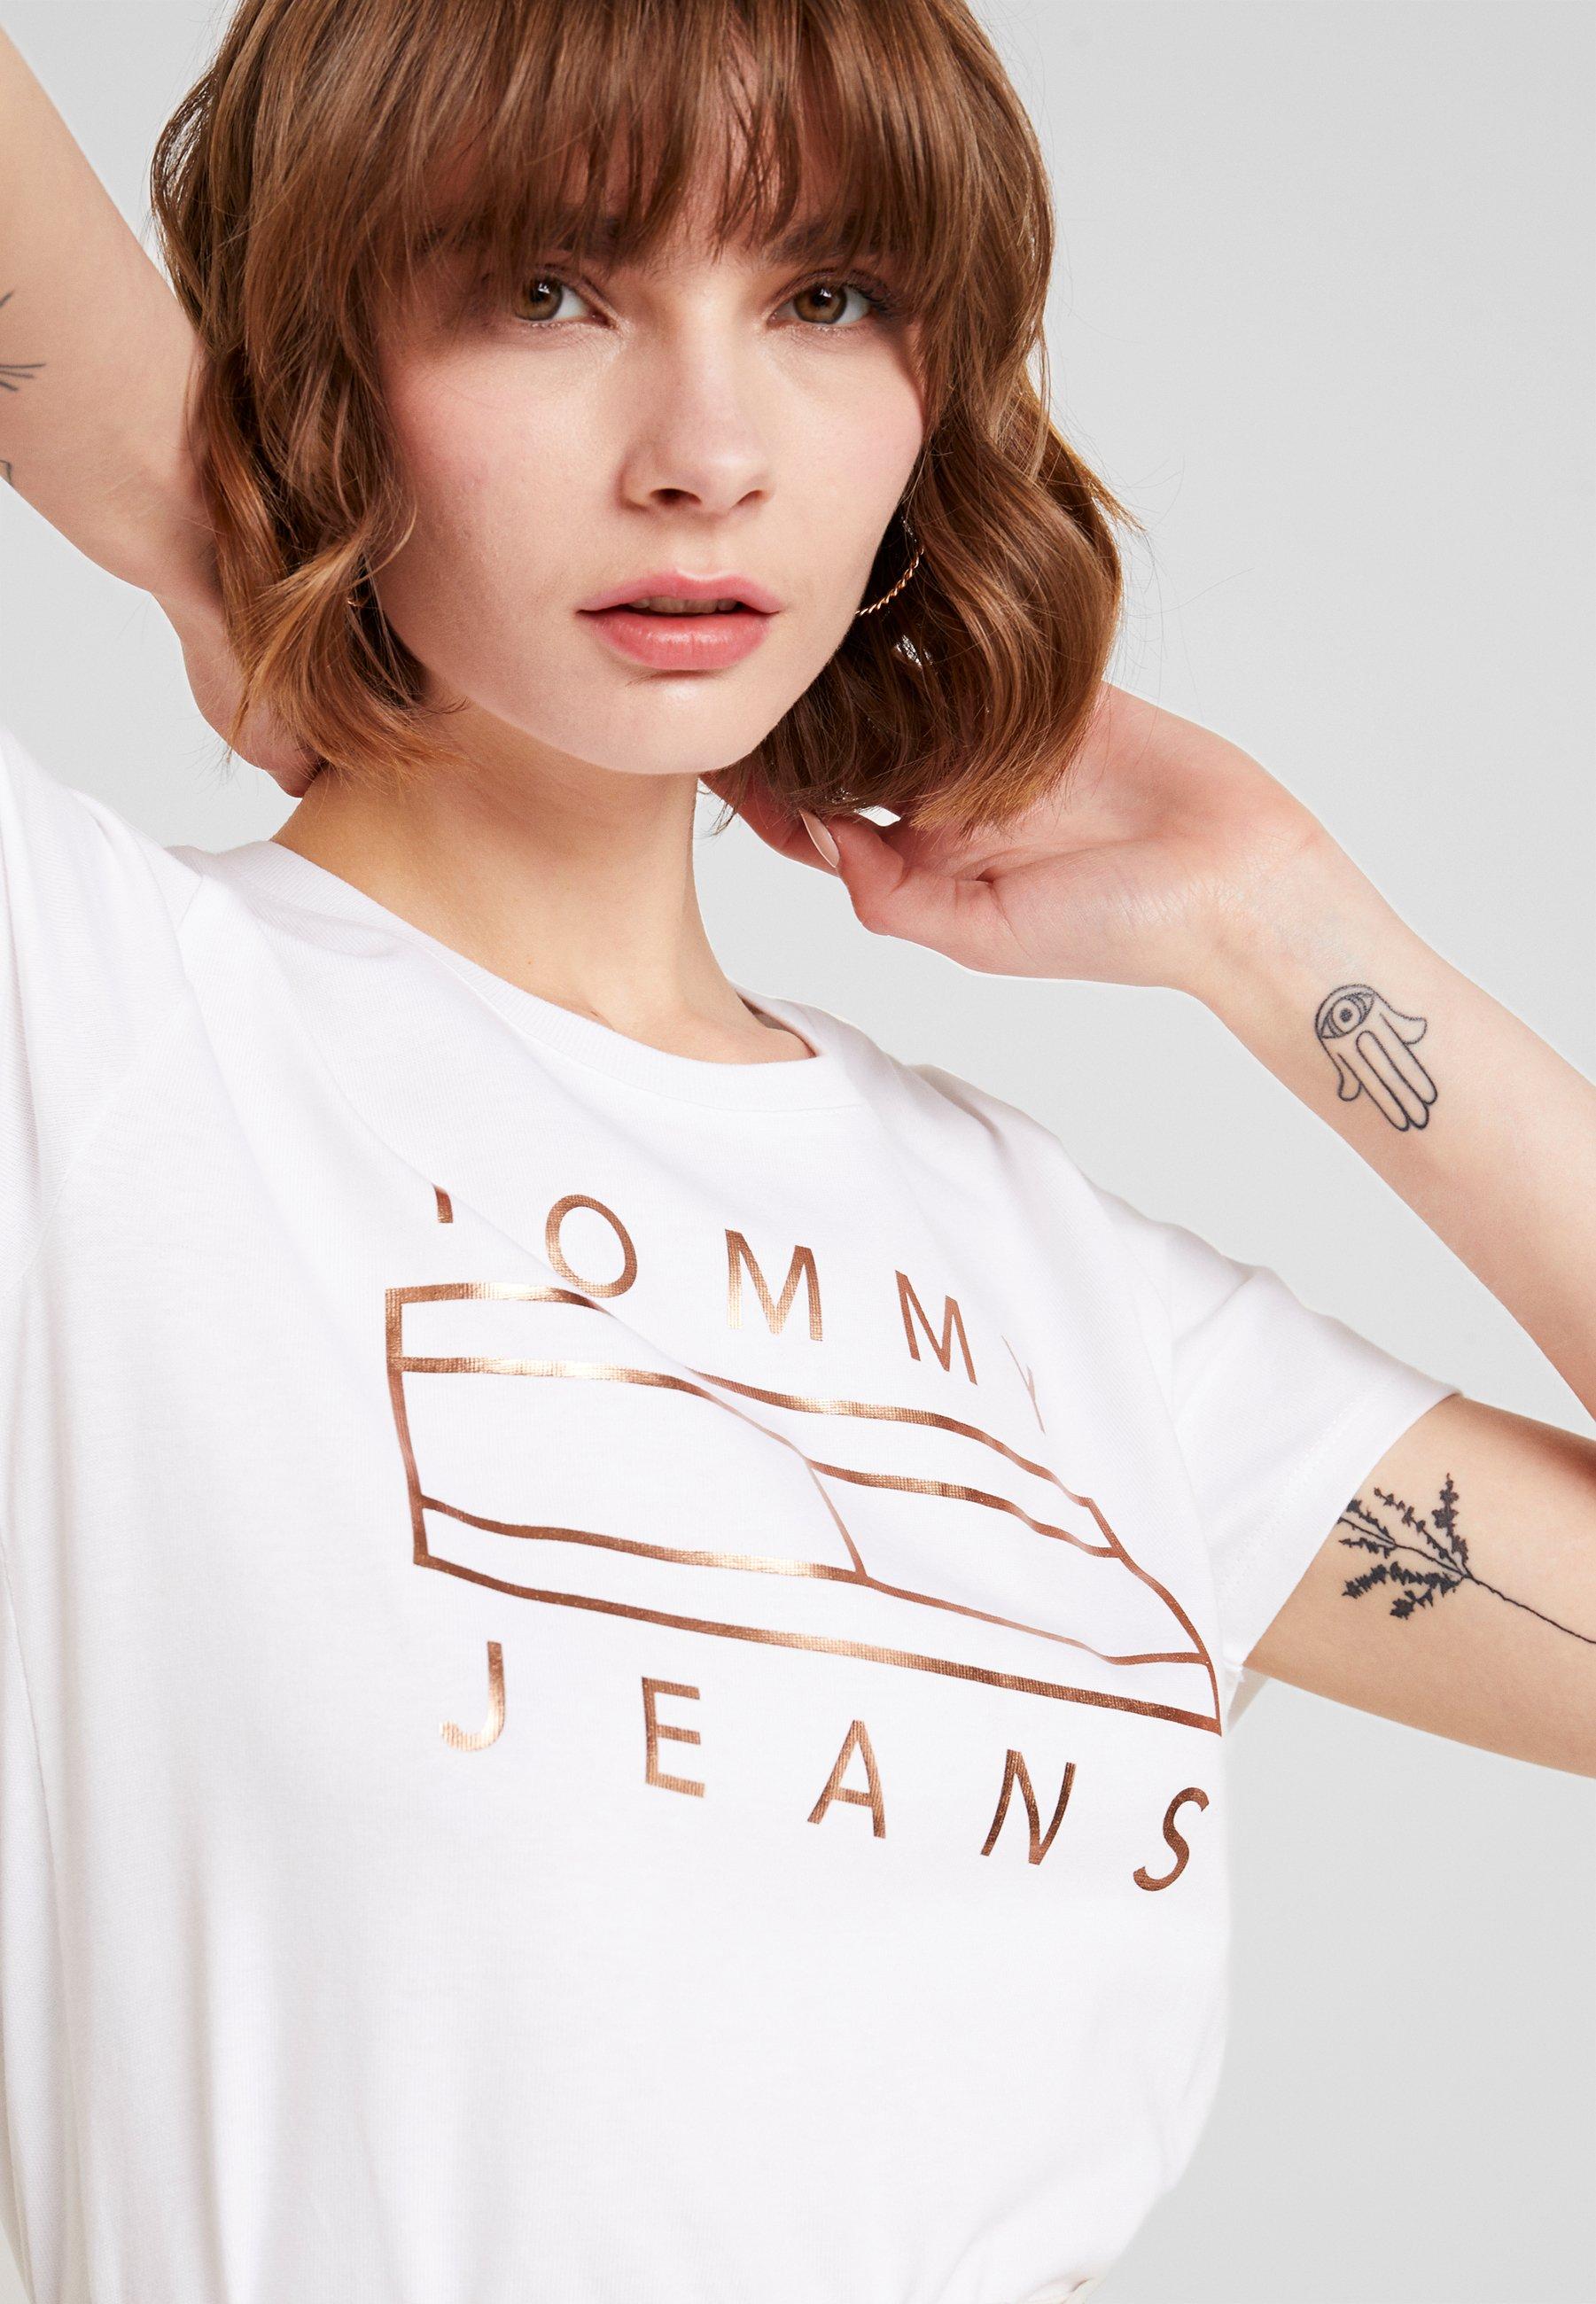 TeeT Tommy Logo White Imprimé shirt Jeans Classic Metallic mwn08vN